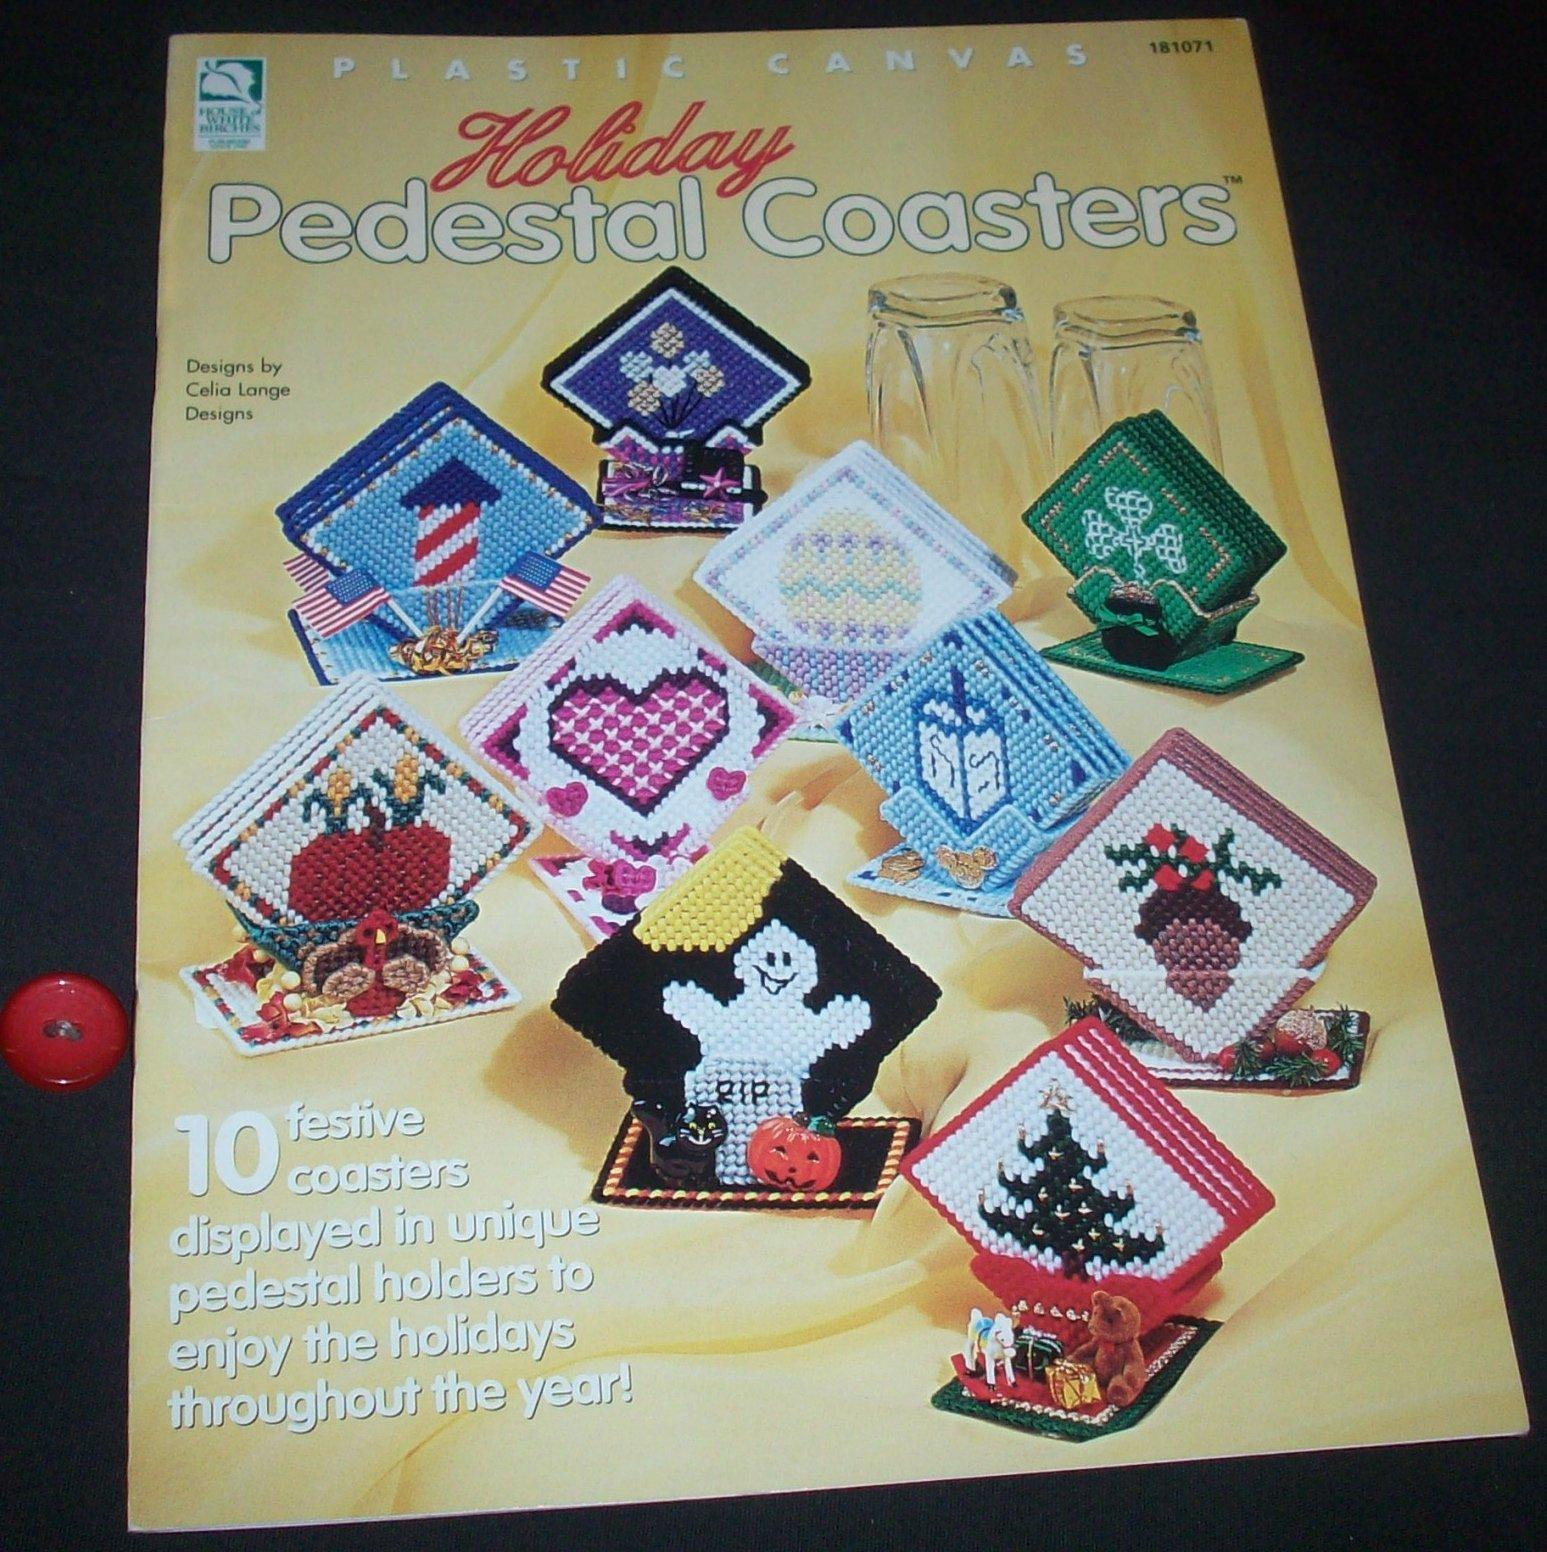 Plastic Canvas Christmas Coaster Patterns.Plastic Canvas Holiday Pedestal Coasters 181071 Celia